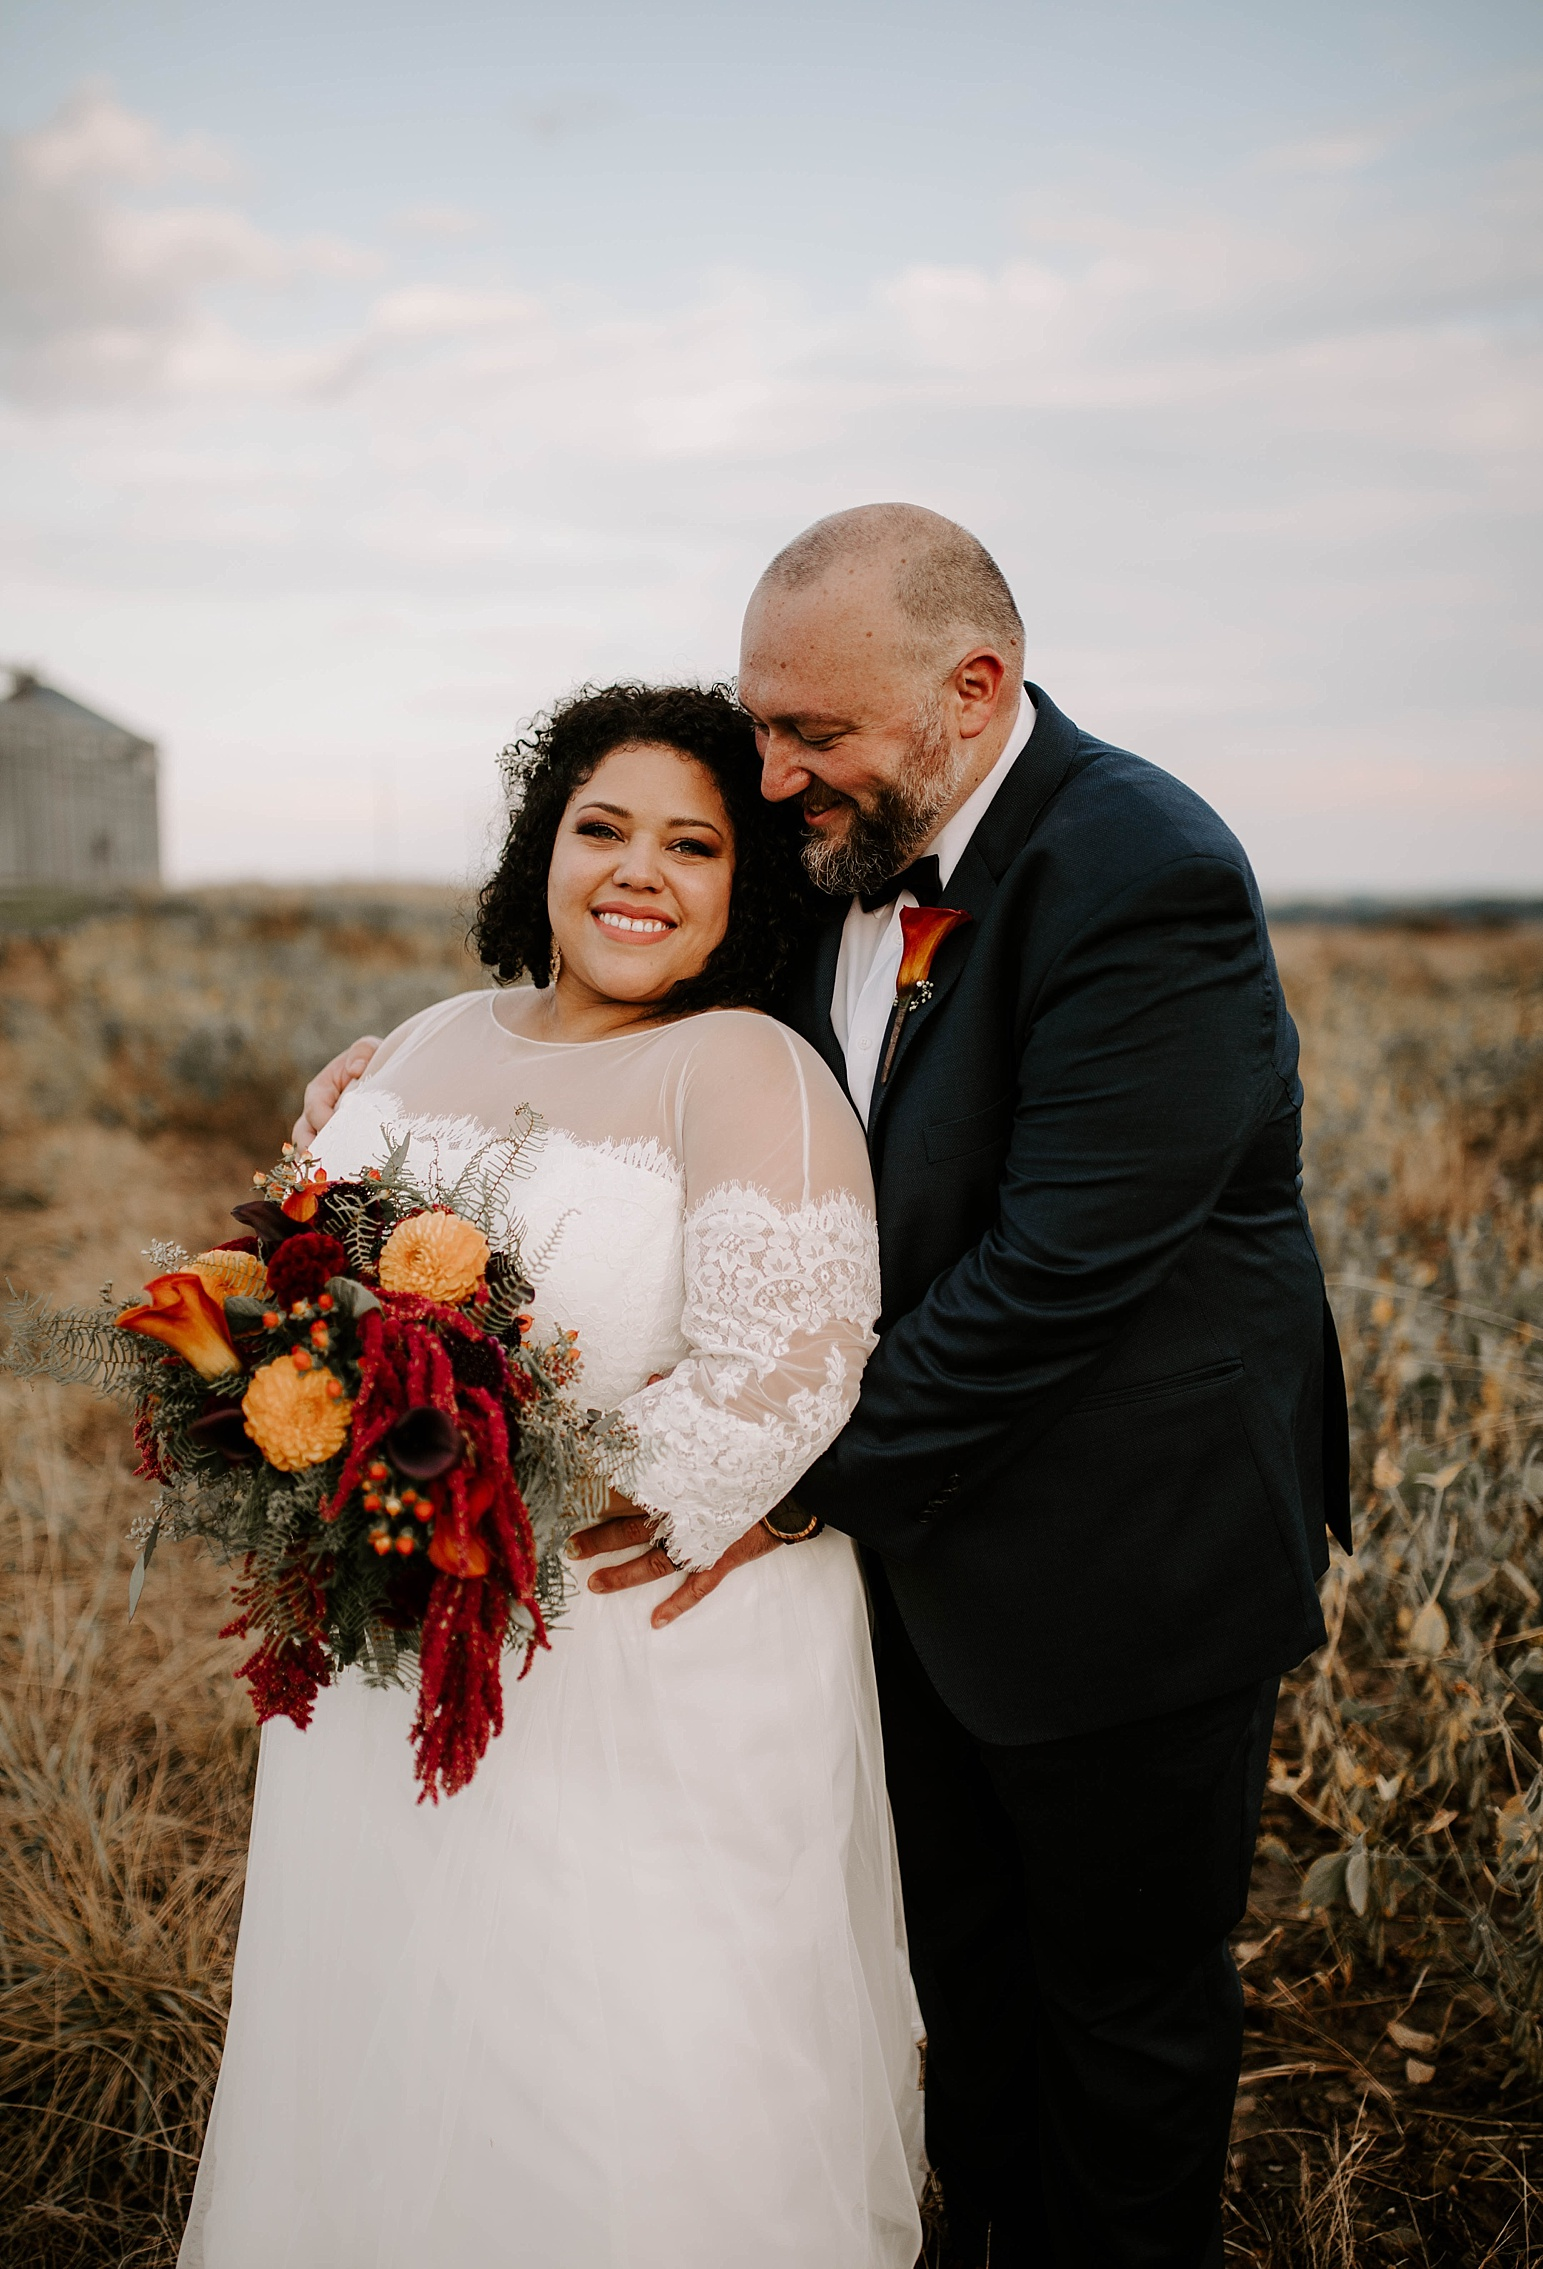 ashley_sara_photography_pittsburgh-wedding-photographer_ohio-wedding-photographer_destination-wedding-photographer7.jpg